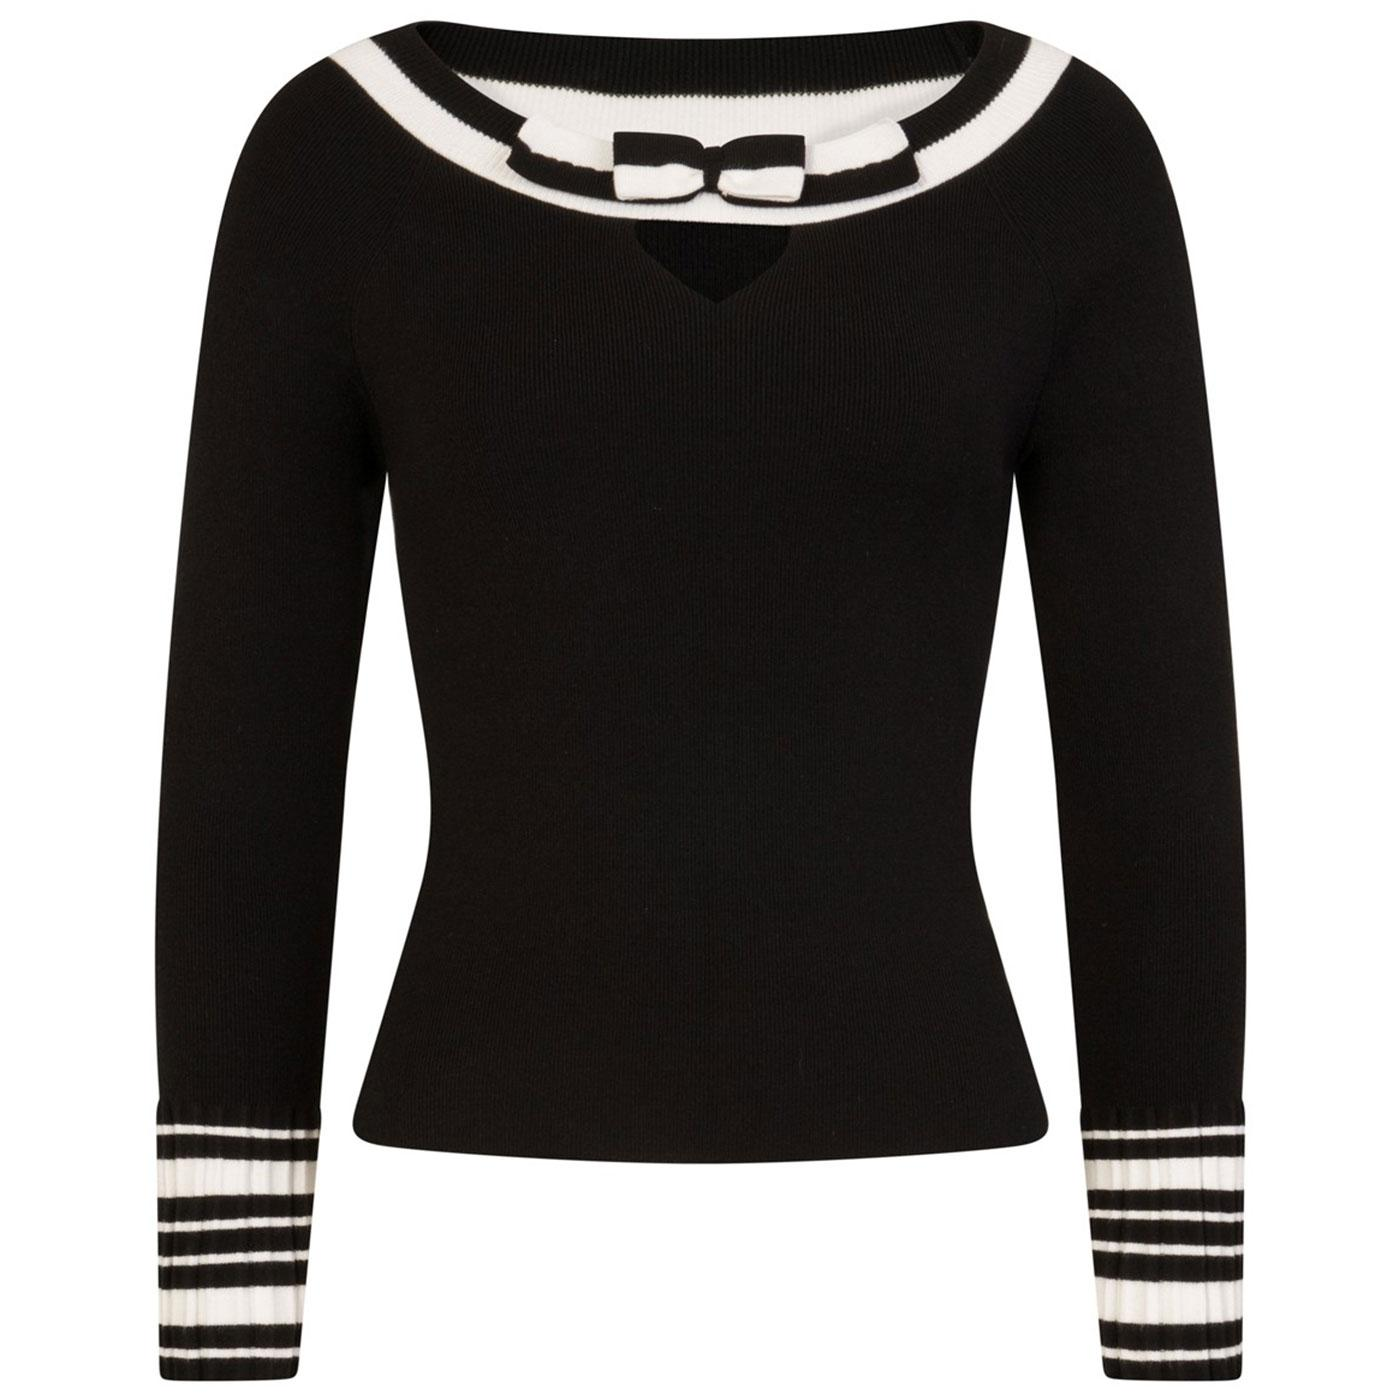 Elodie HELL BUNNY Stripe Contrast 50s Jumper Black